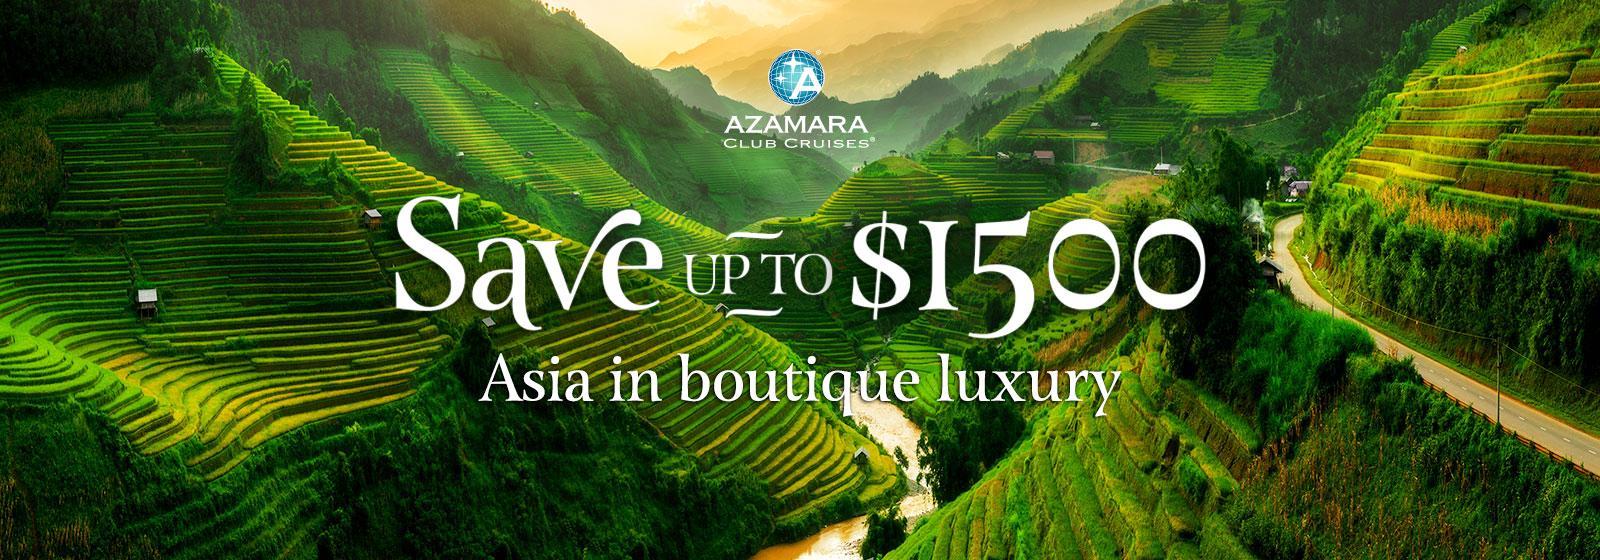 Azamara Spend or Save